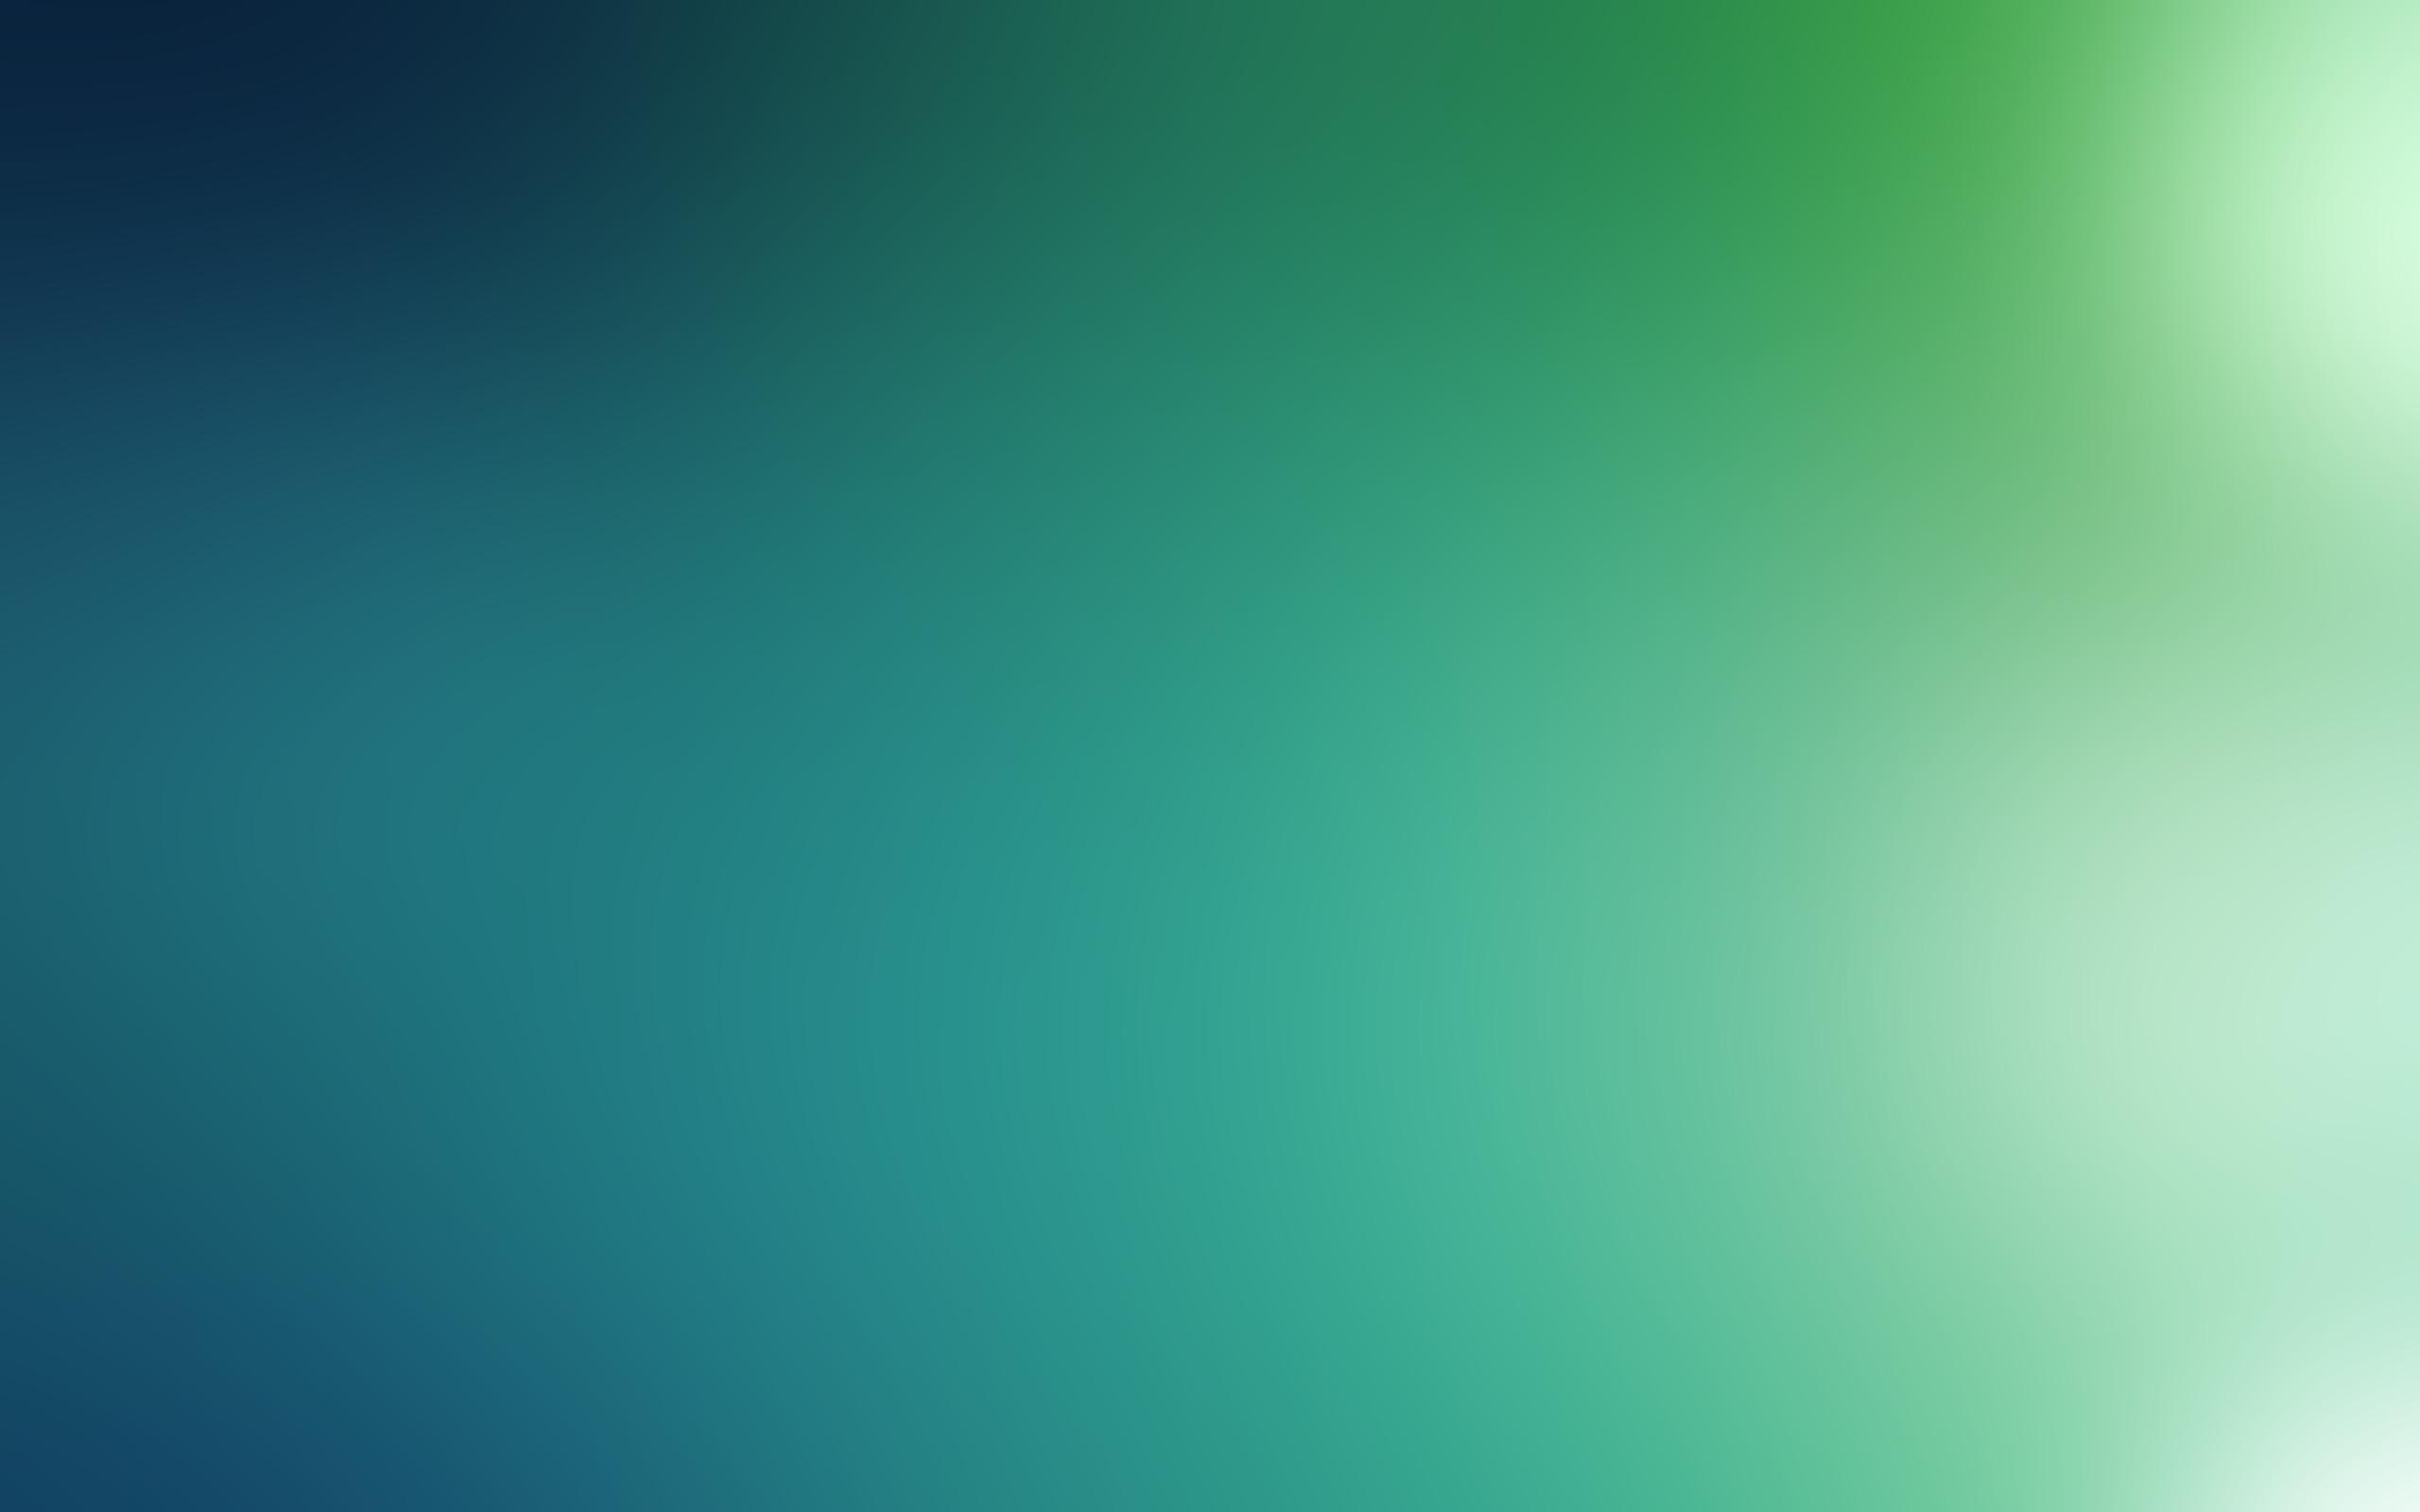 Blue mint plain HD Wallpaper